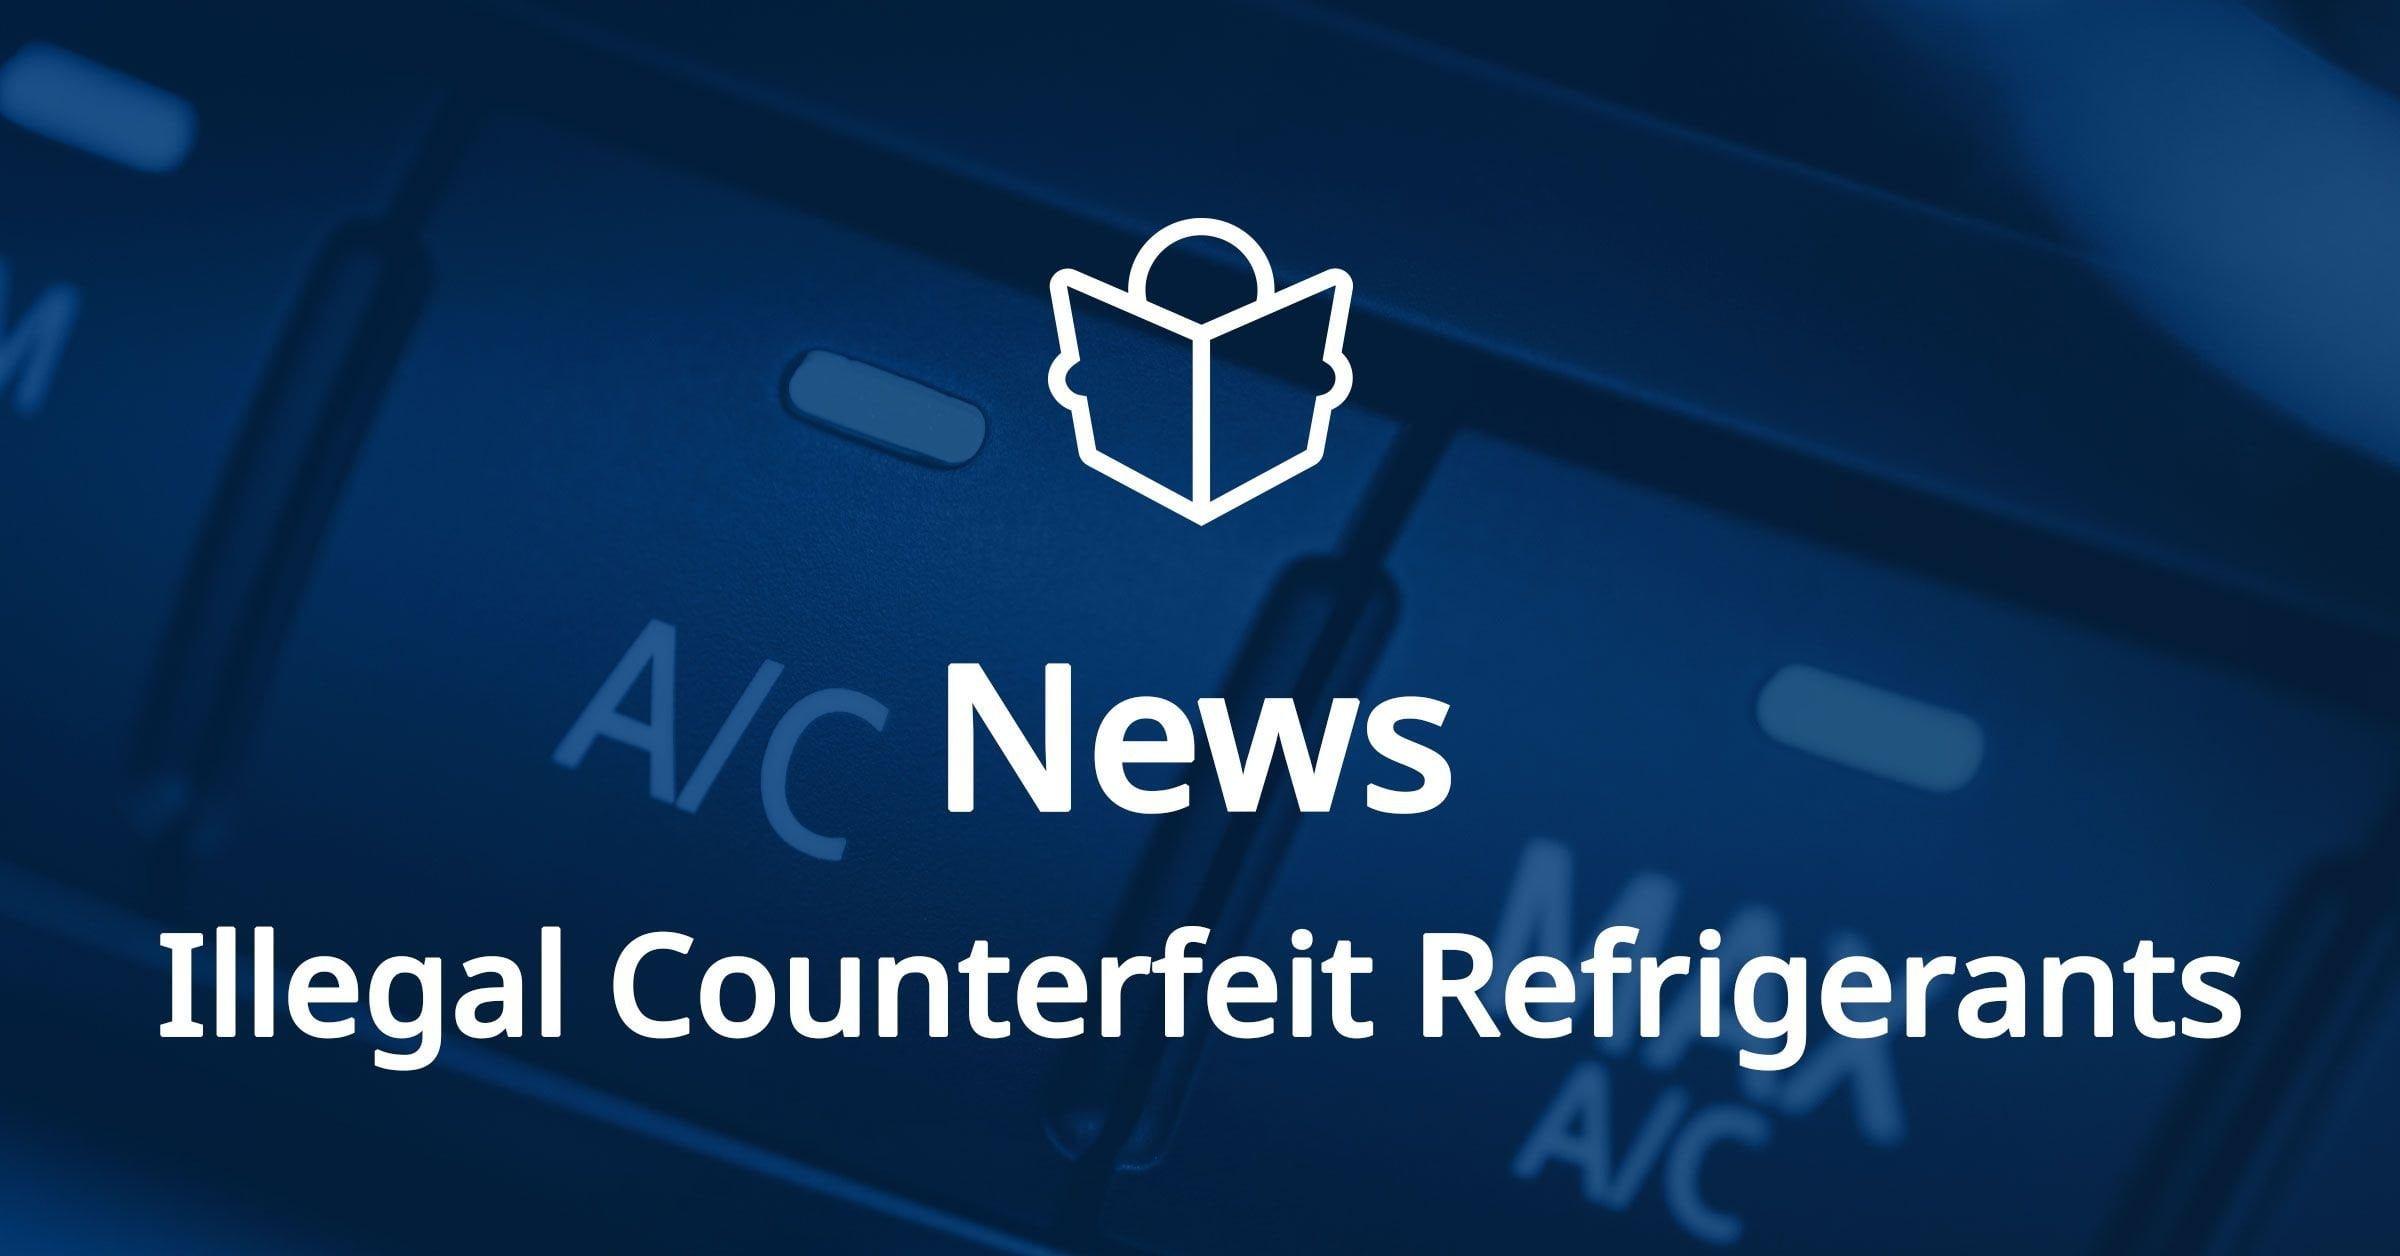 News about illegal counterfeit refrigerants